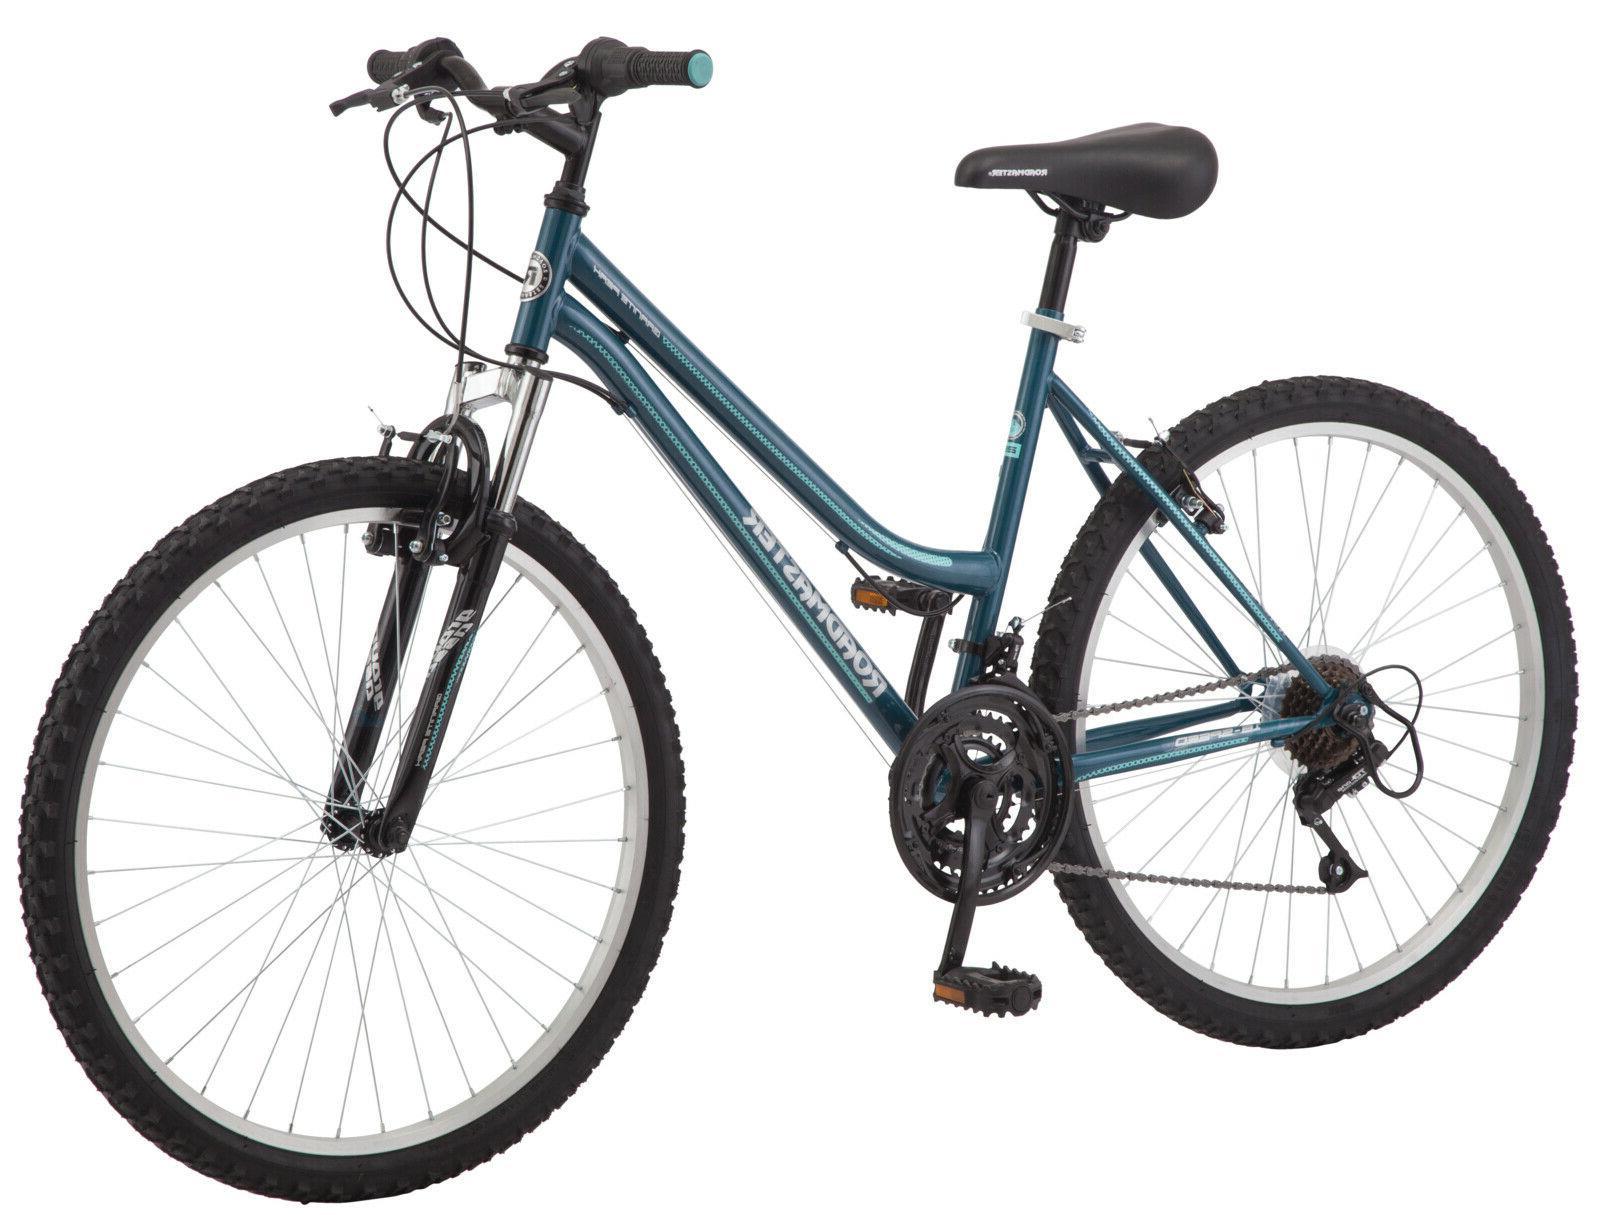 548dfa30021 Roadmaster Granite Peak Mountain Bike | Property Room 26